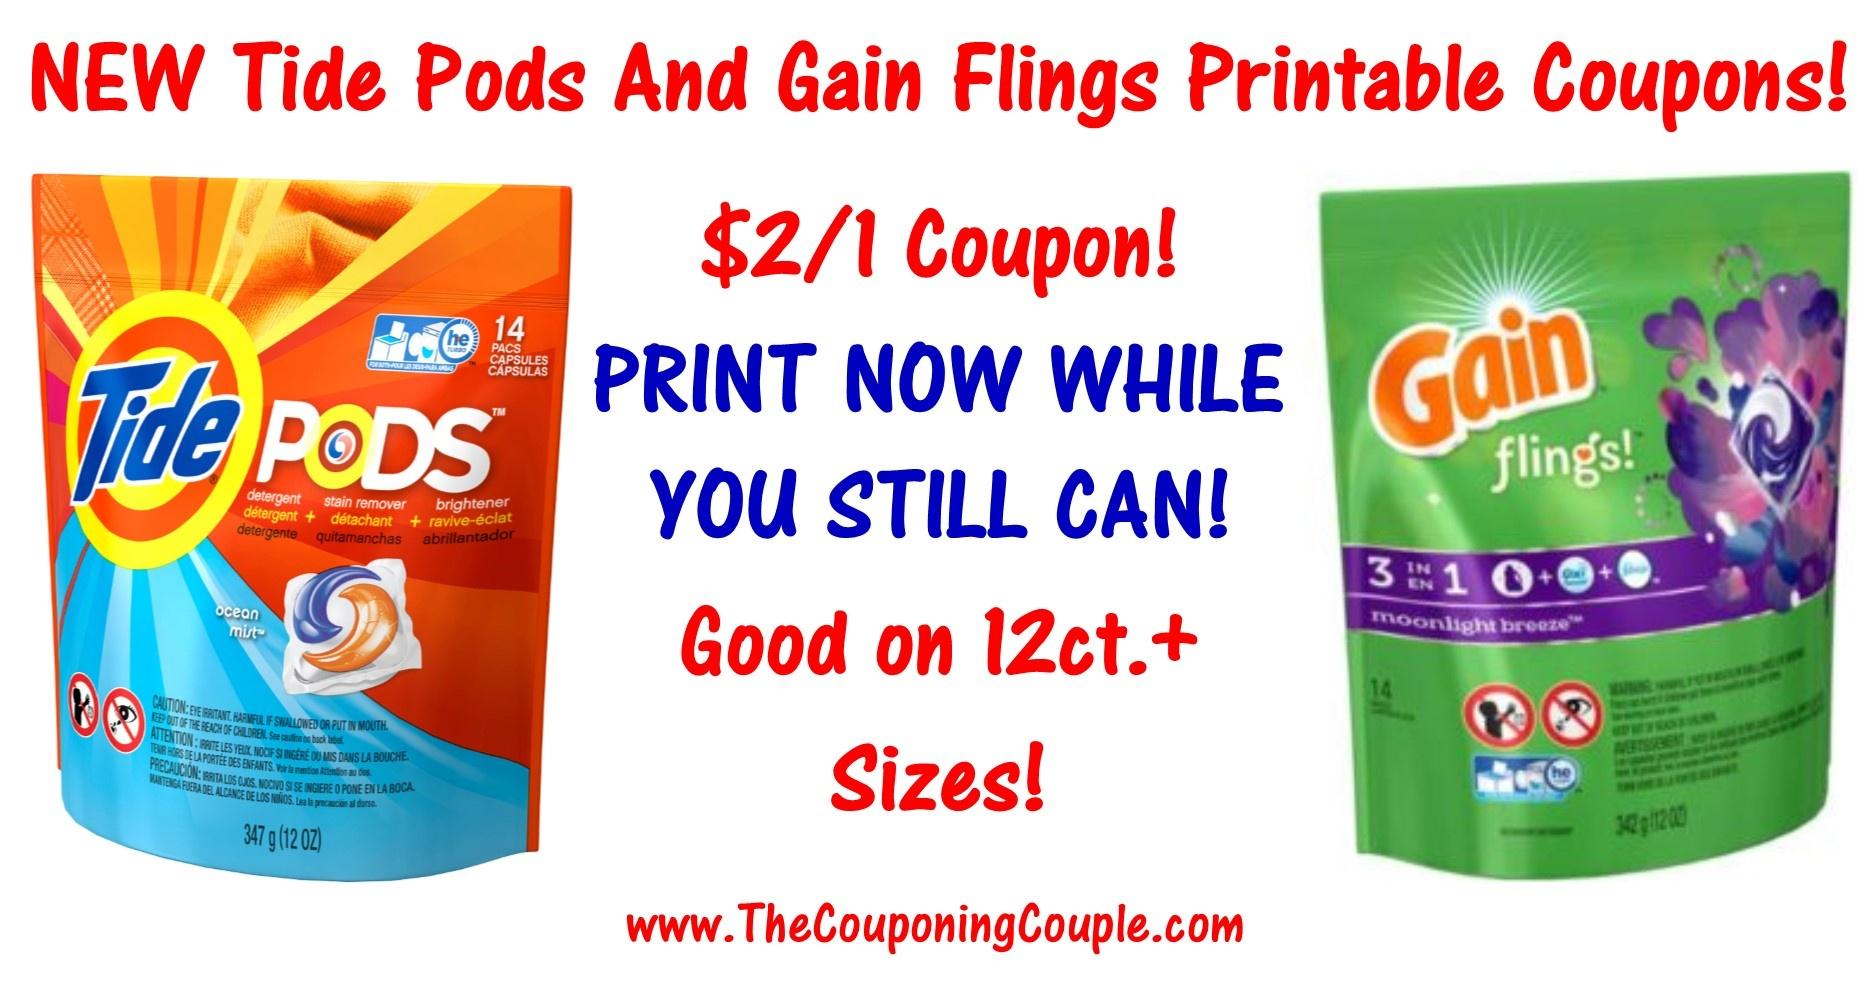 New Tide Pods Printable Coupon & Gain Flings Printable - Gain Coupons Free Printable